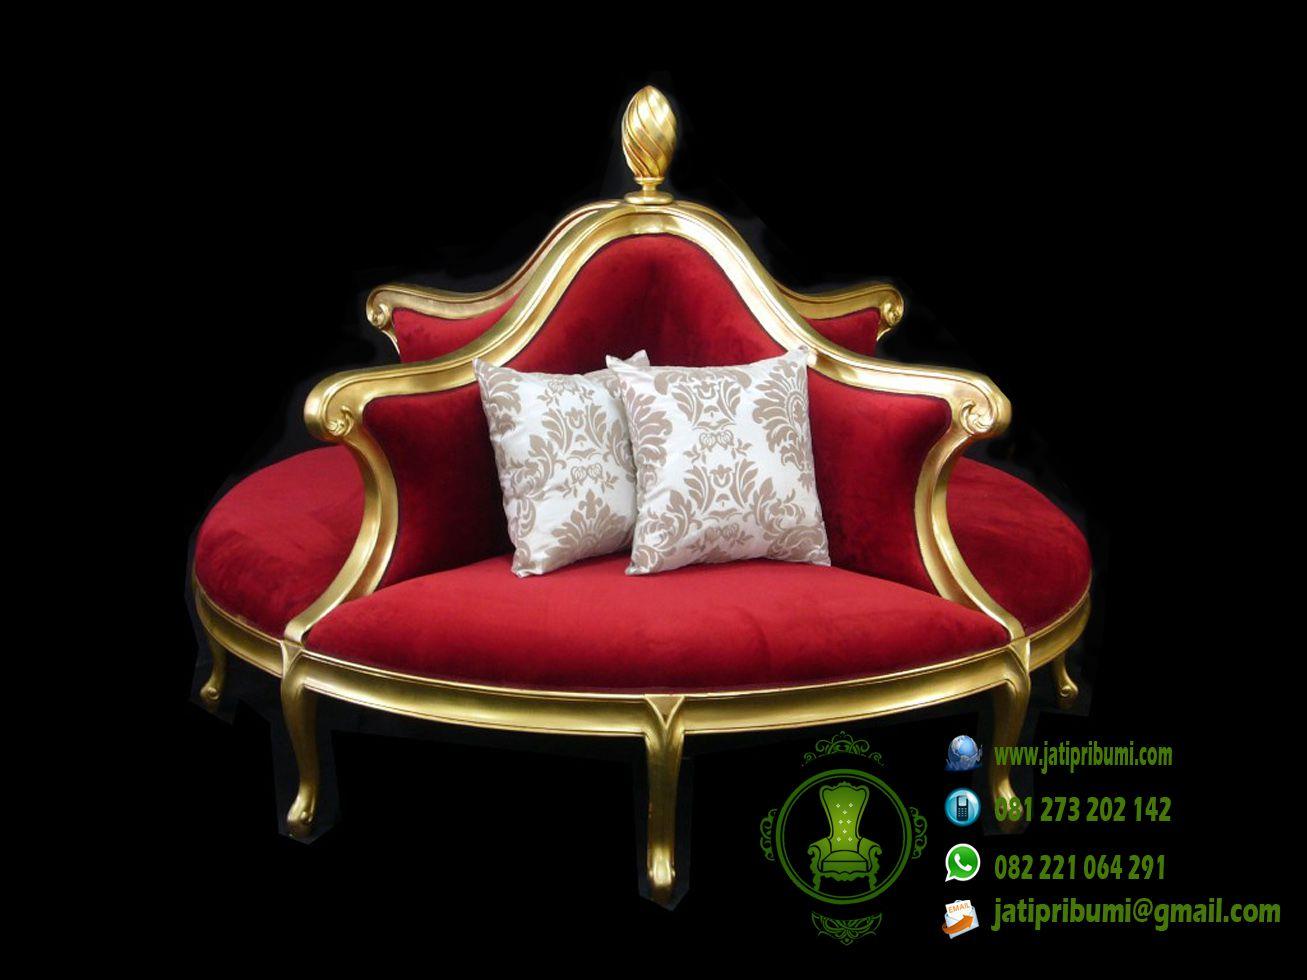 sofa bundar dudukan 4 ukiran jepara mewah model terbaru 2016